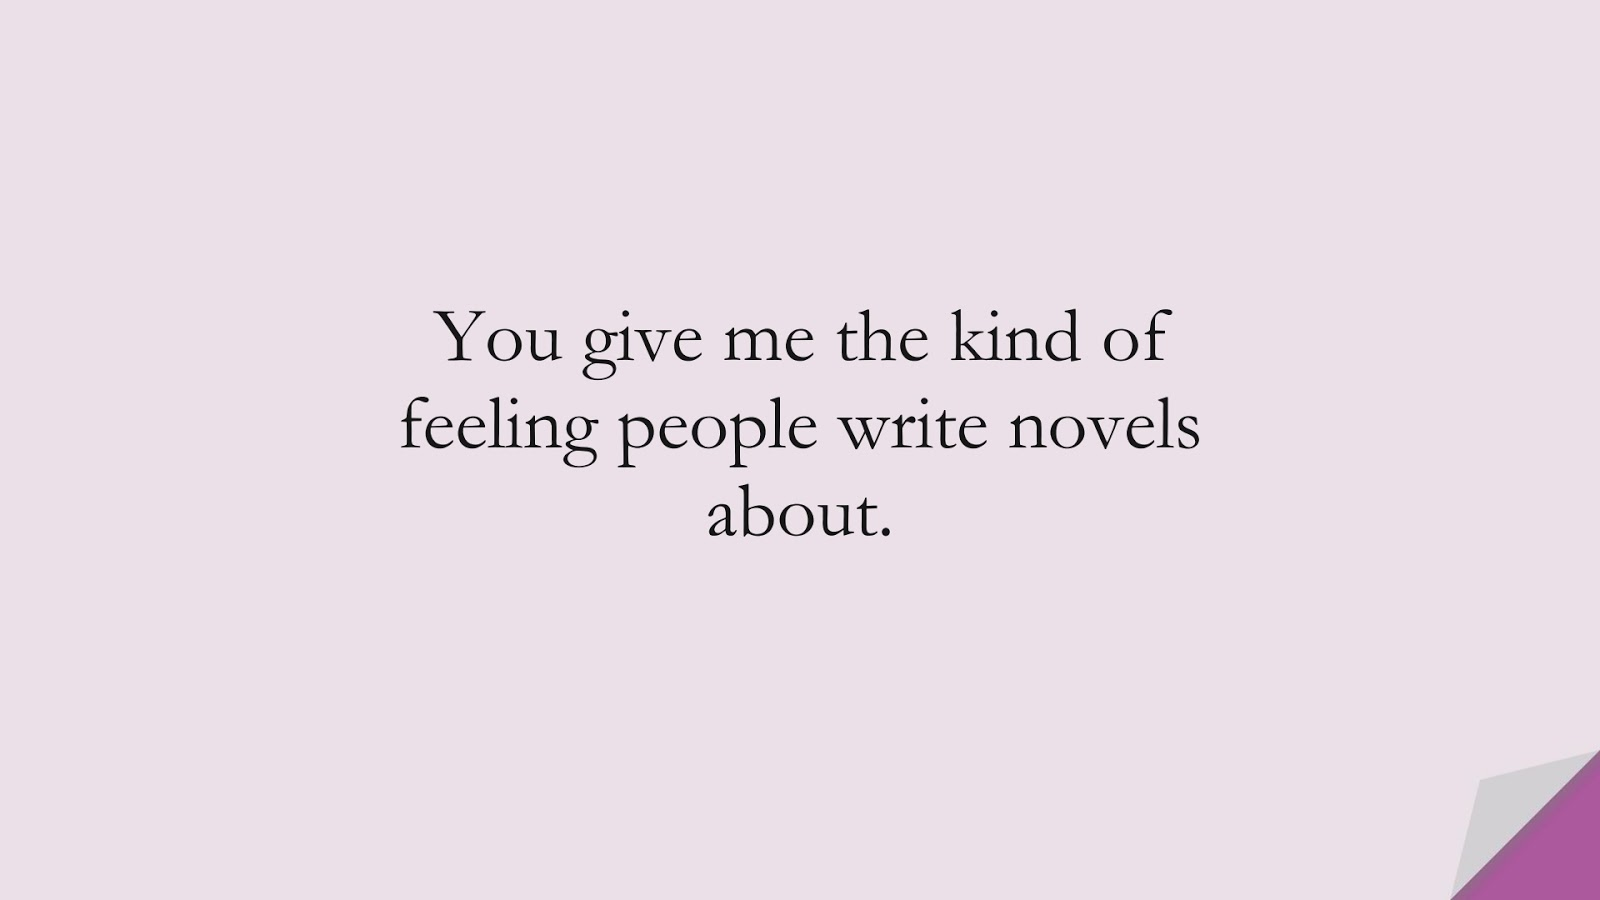 You give me the kind of feeling people write novels about.FALSE